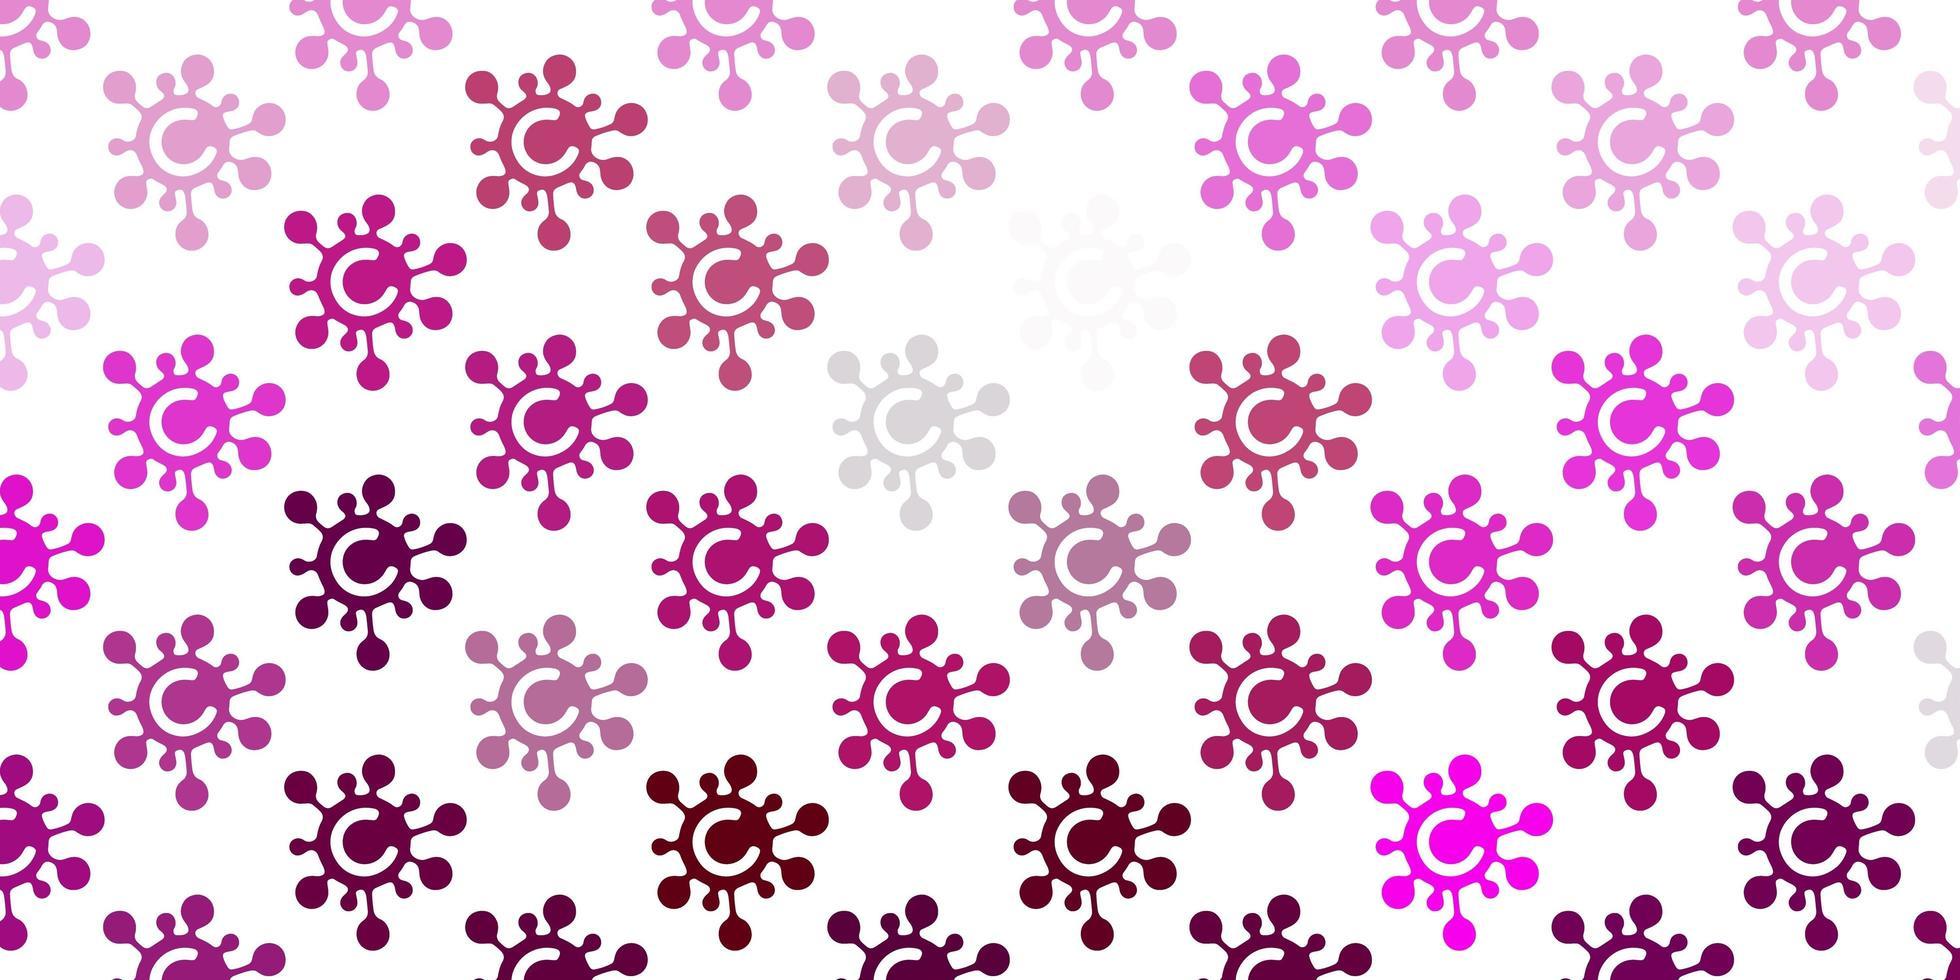 textura vector rosa claro com símbolos de doença.